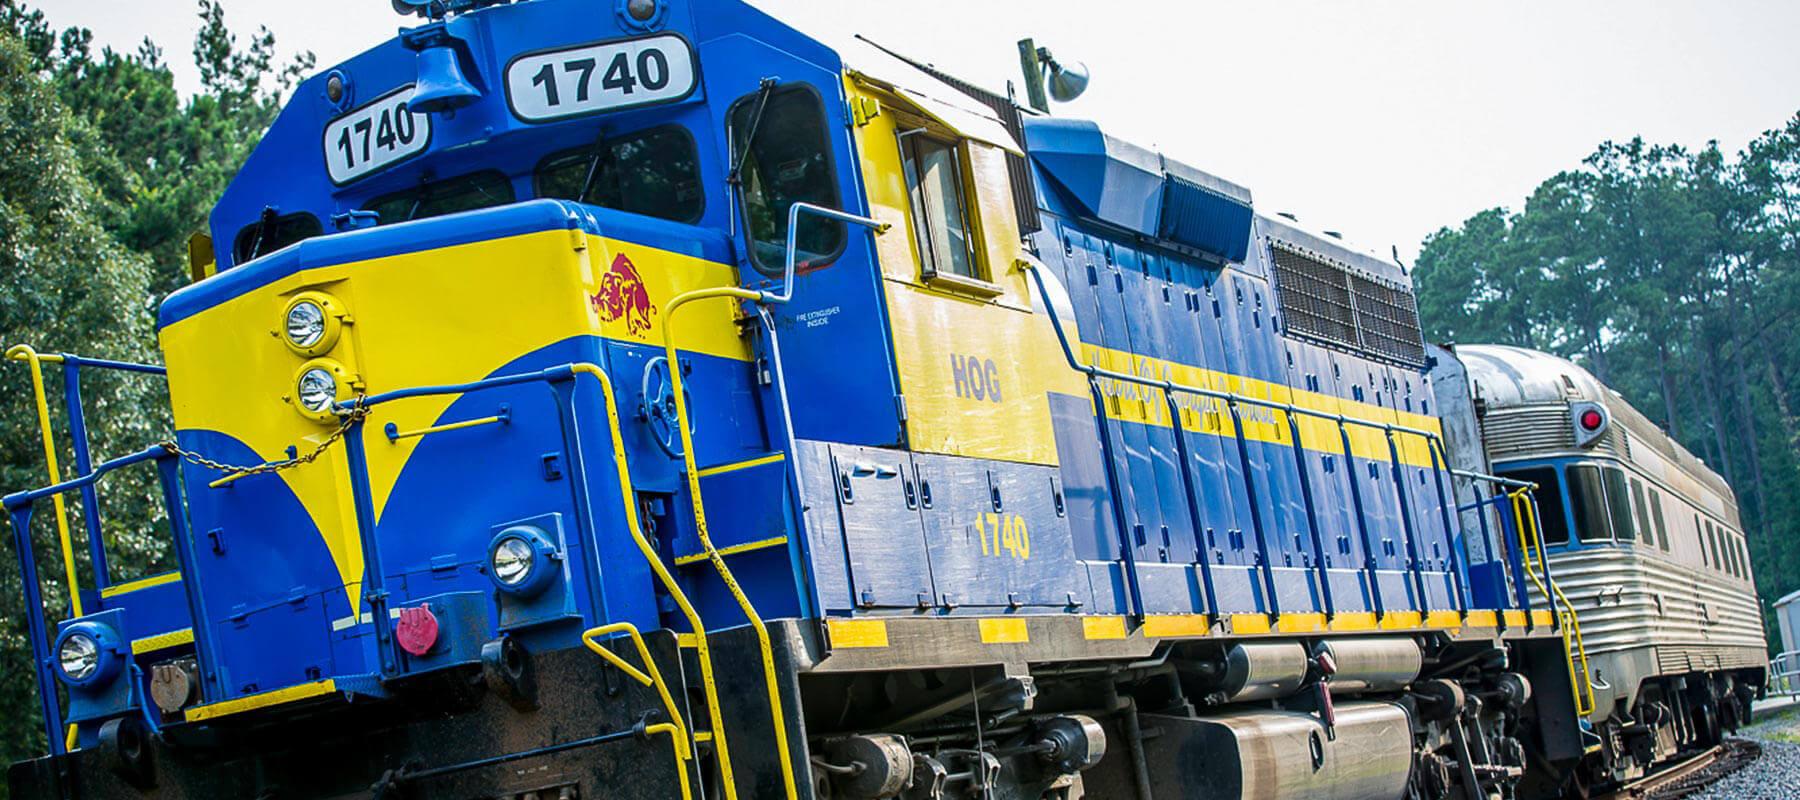 Lake-Blackshear-Georgia-Train-Excursions-GA-Veterans-Park-SAM-Shortline-Train-Slider-6-georgia-train-rides